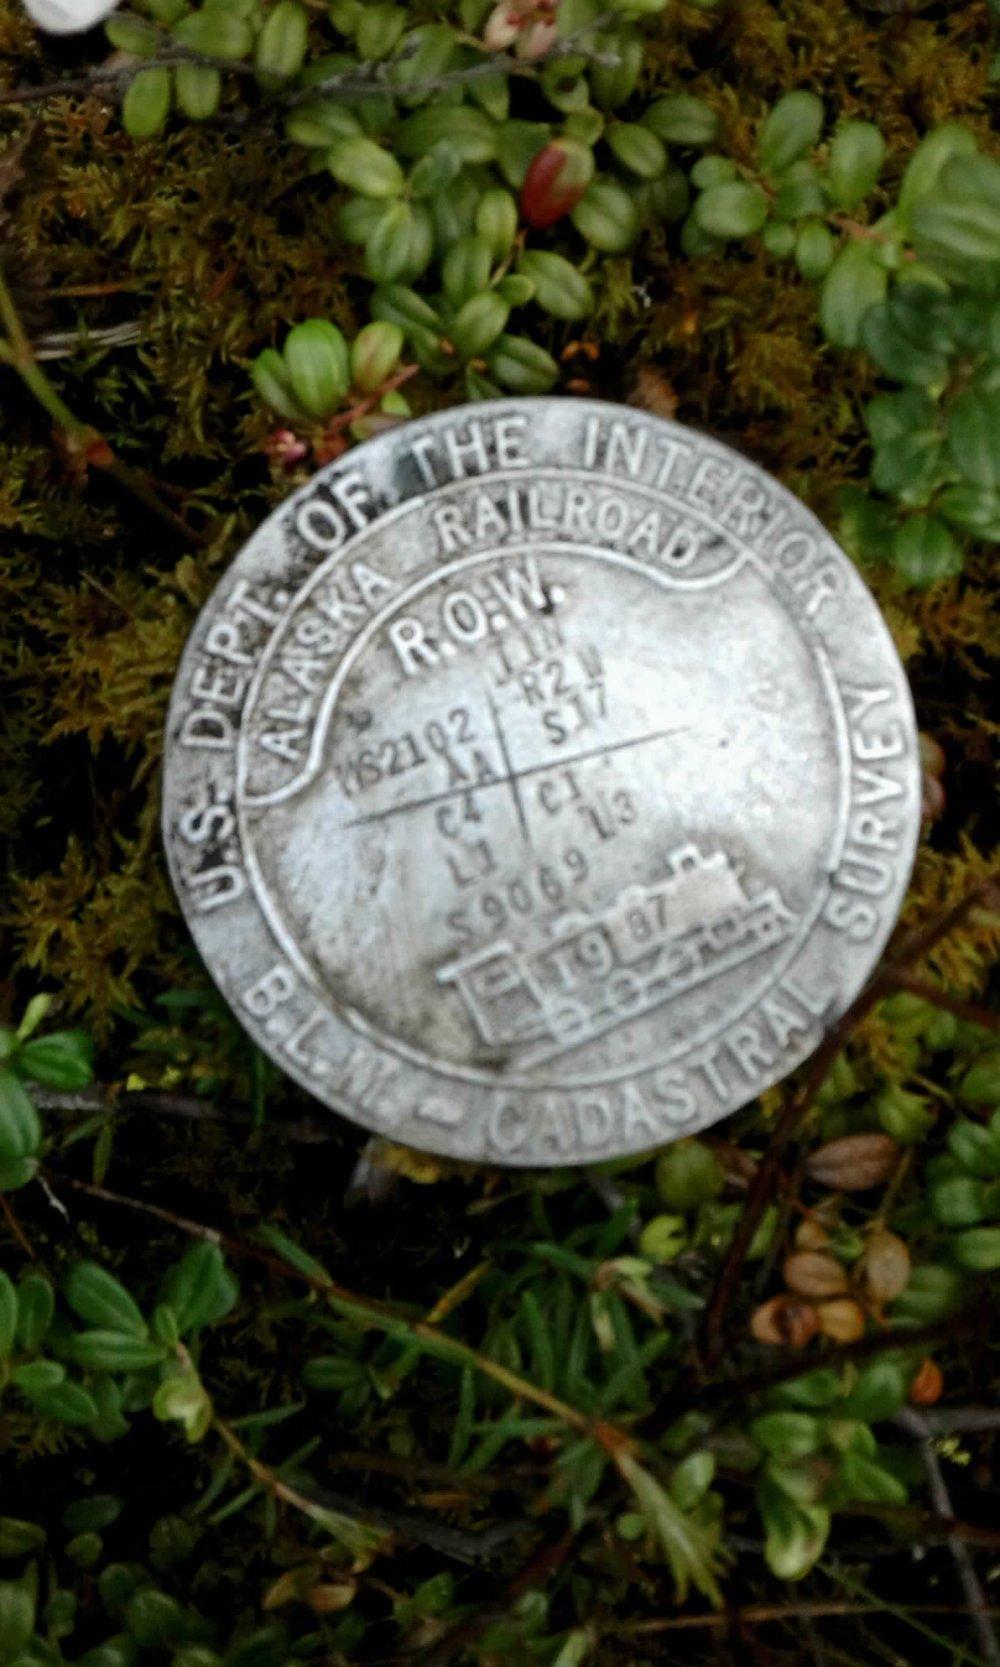 AK Railroad ROW & Mineral Survey Monument.